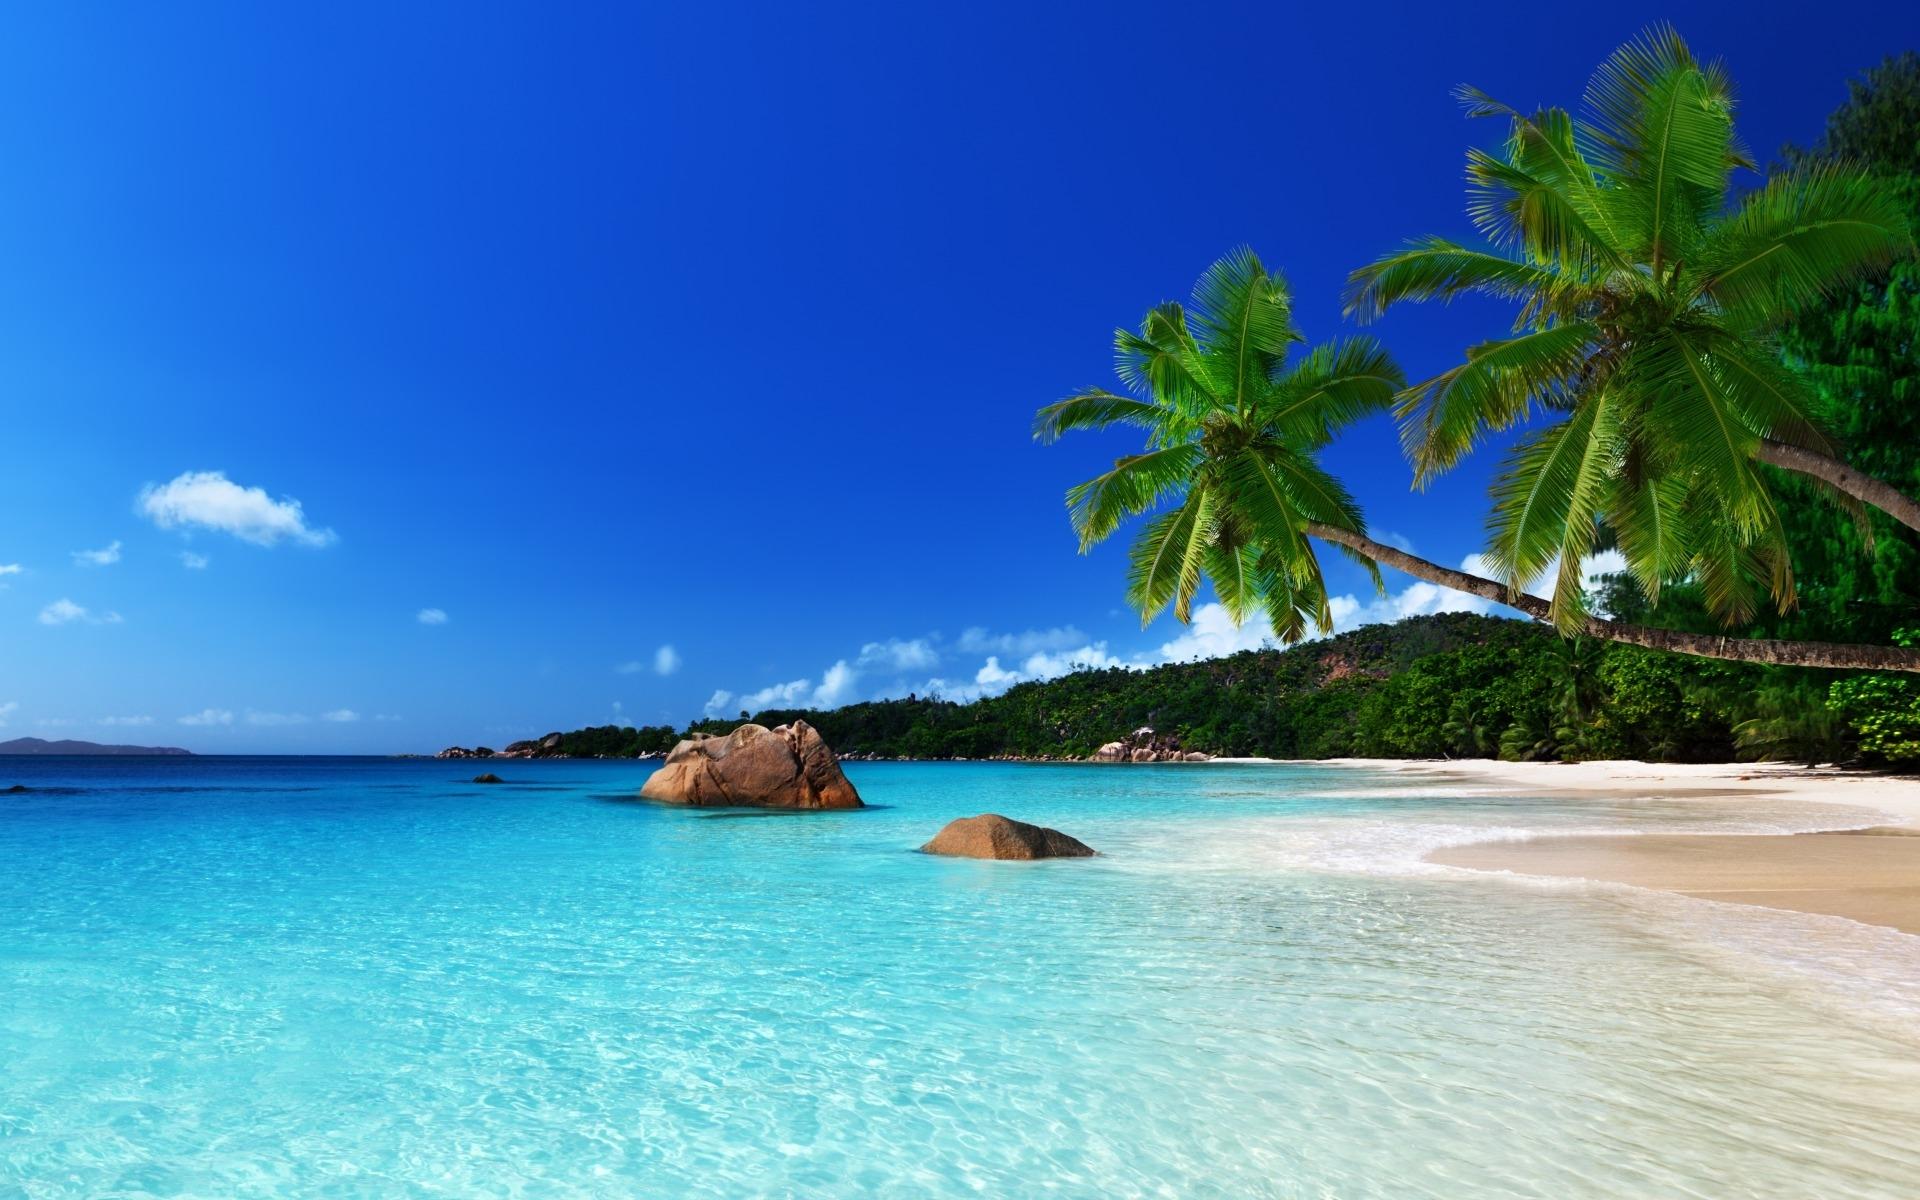 tropical island background wallpapersafari. Black Bedroom Furniture Sets. Home Design Ideas